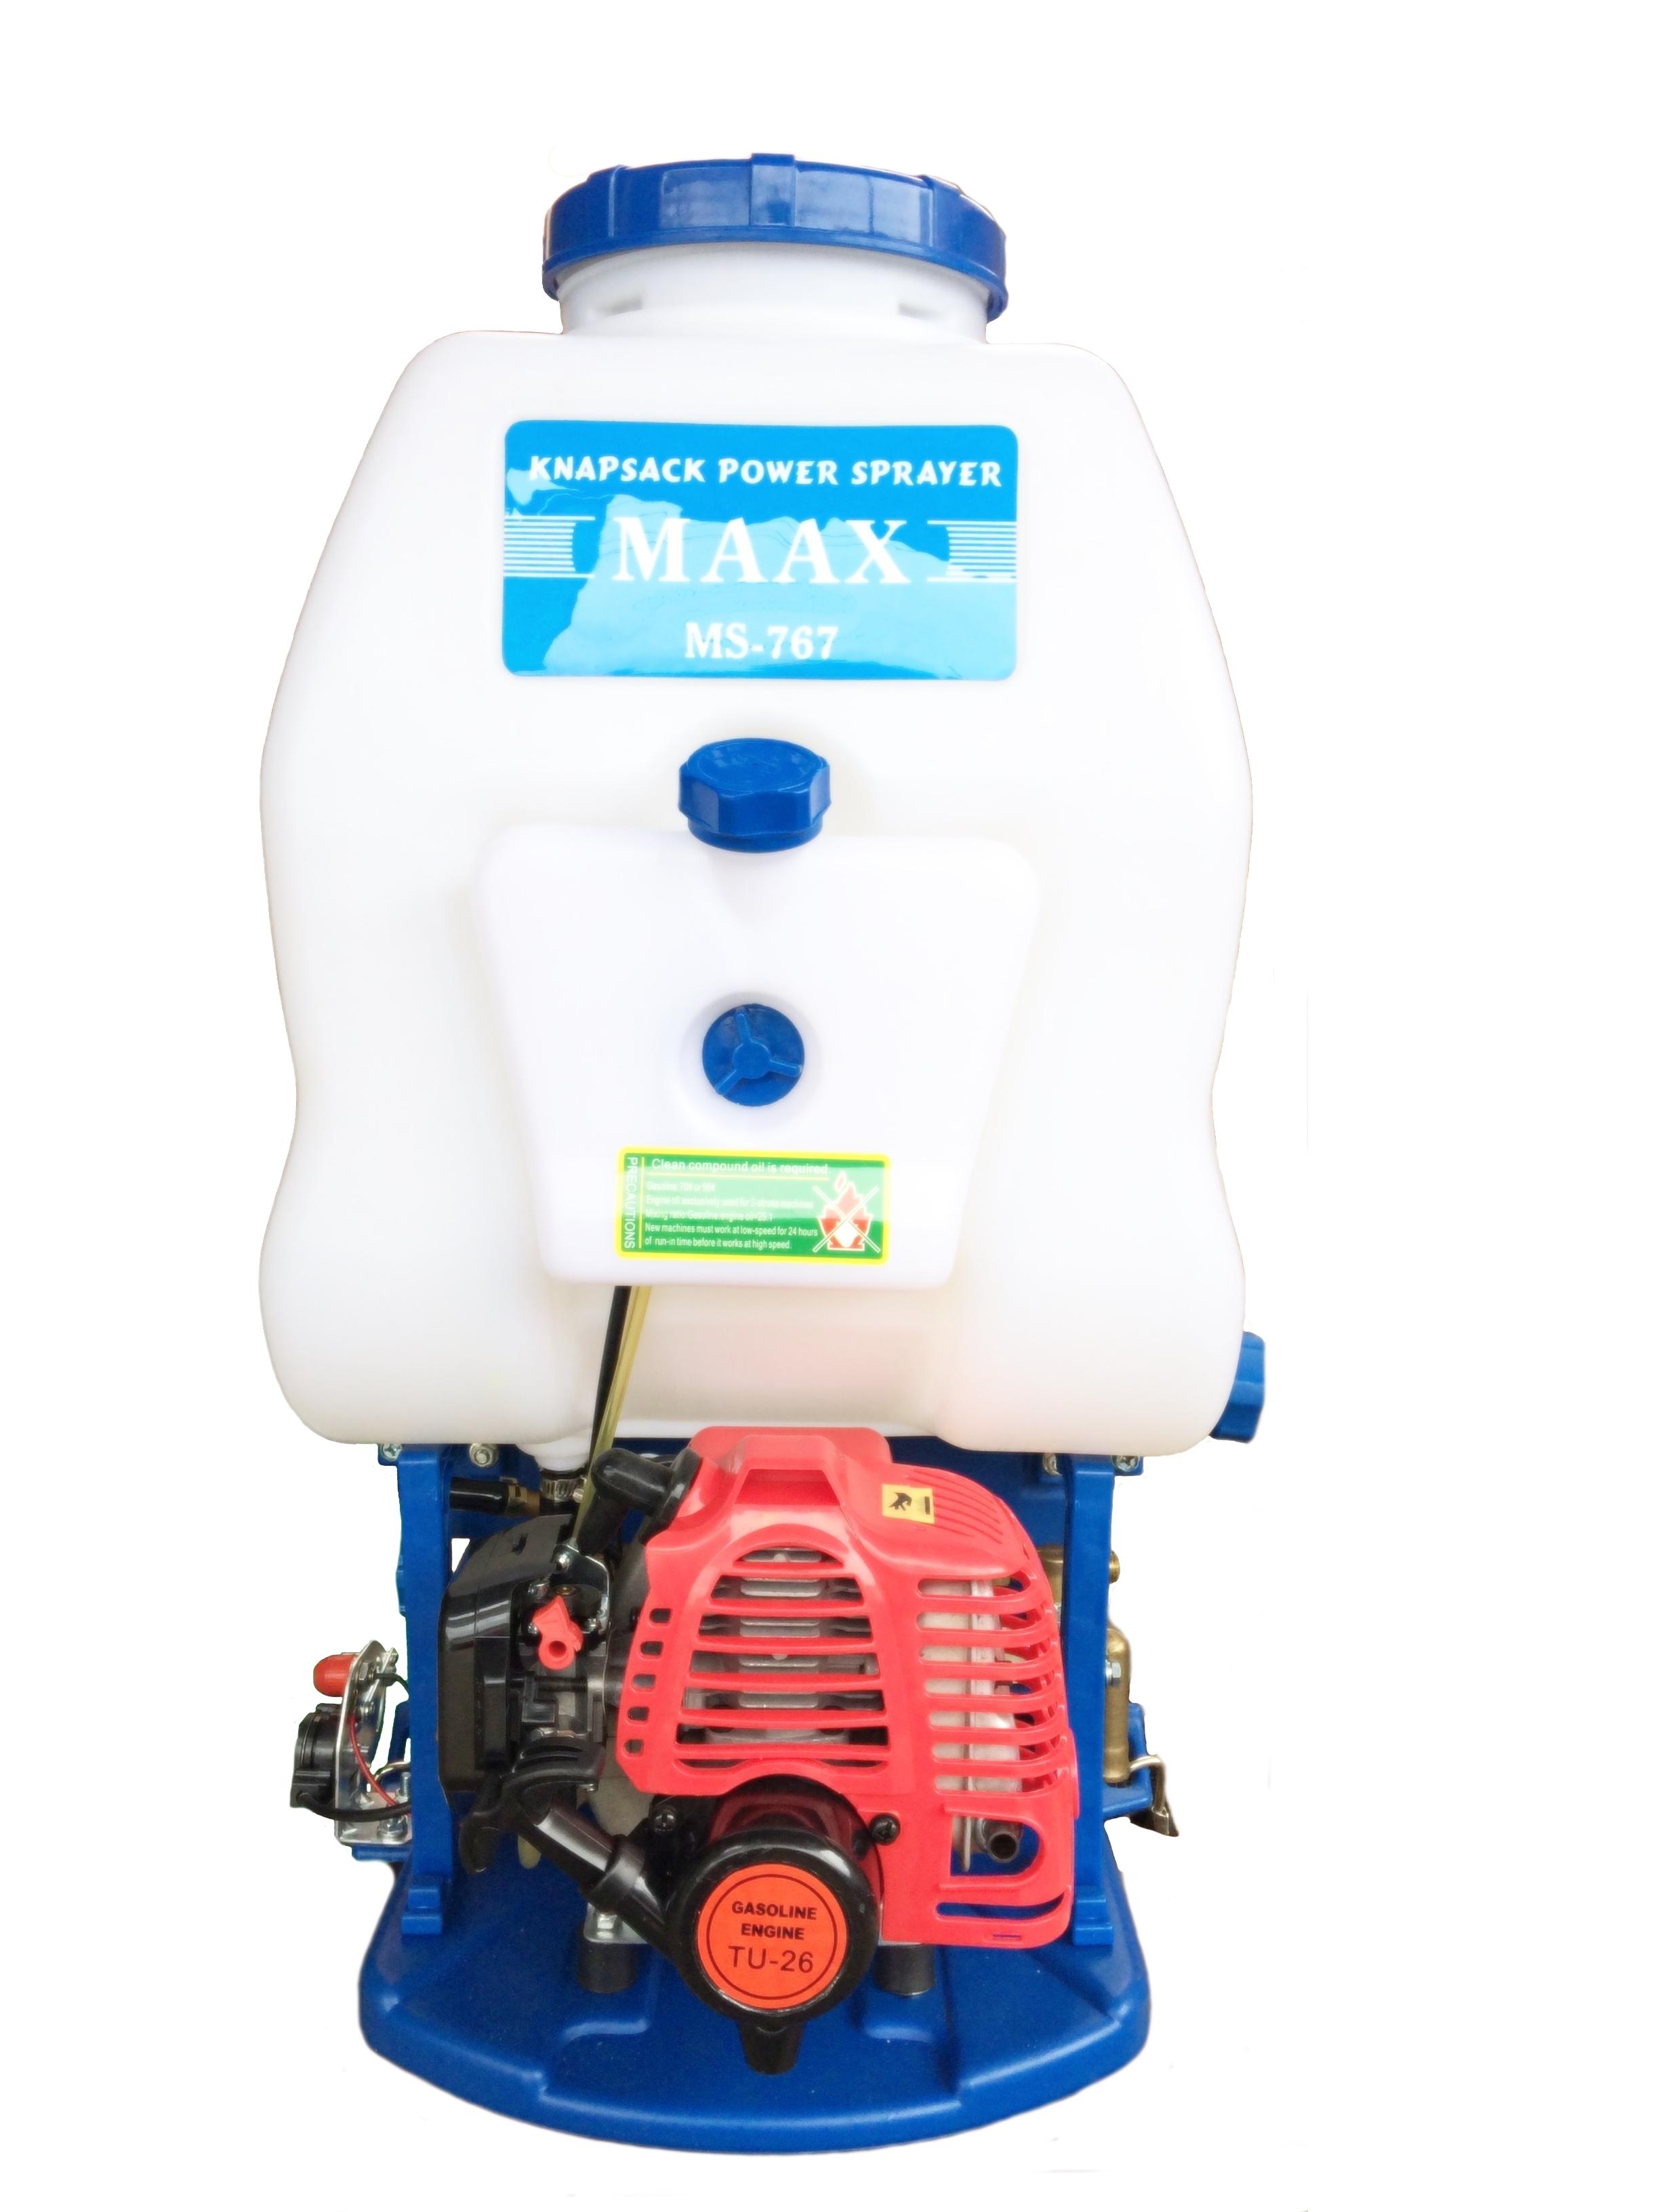 KNAPSACK POWER SPRAYER - MS767L